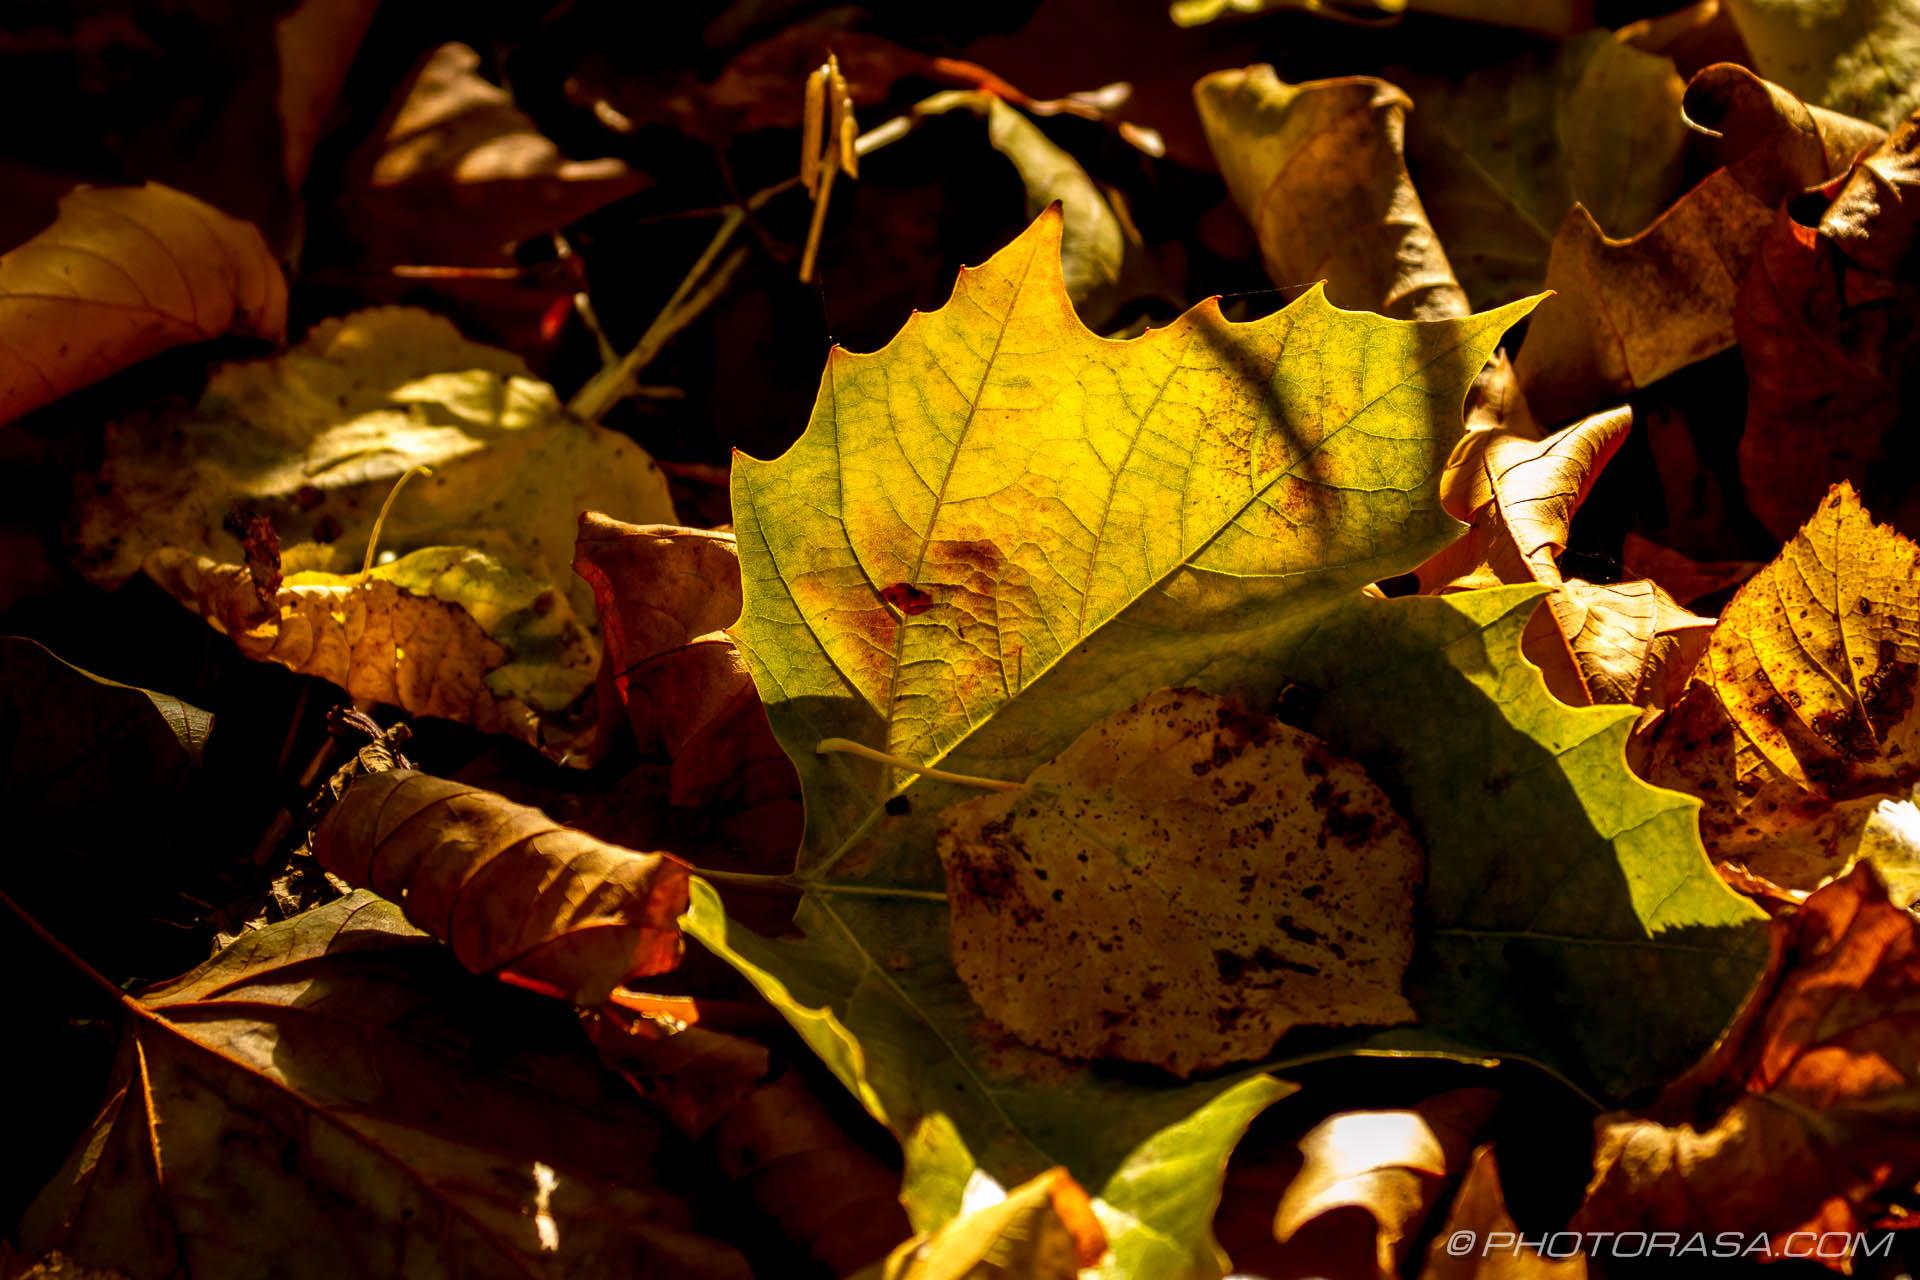 http://photorasa.com/autumn-leaves/autumn-leaves-in-sunlight-2/